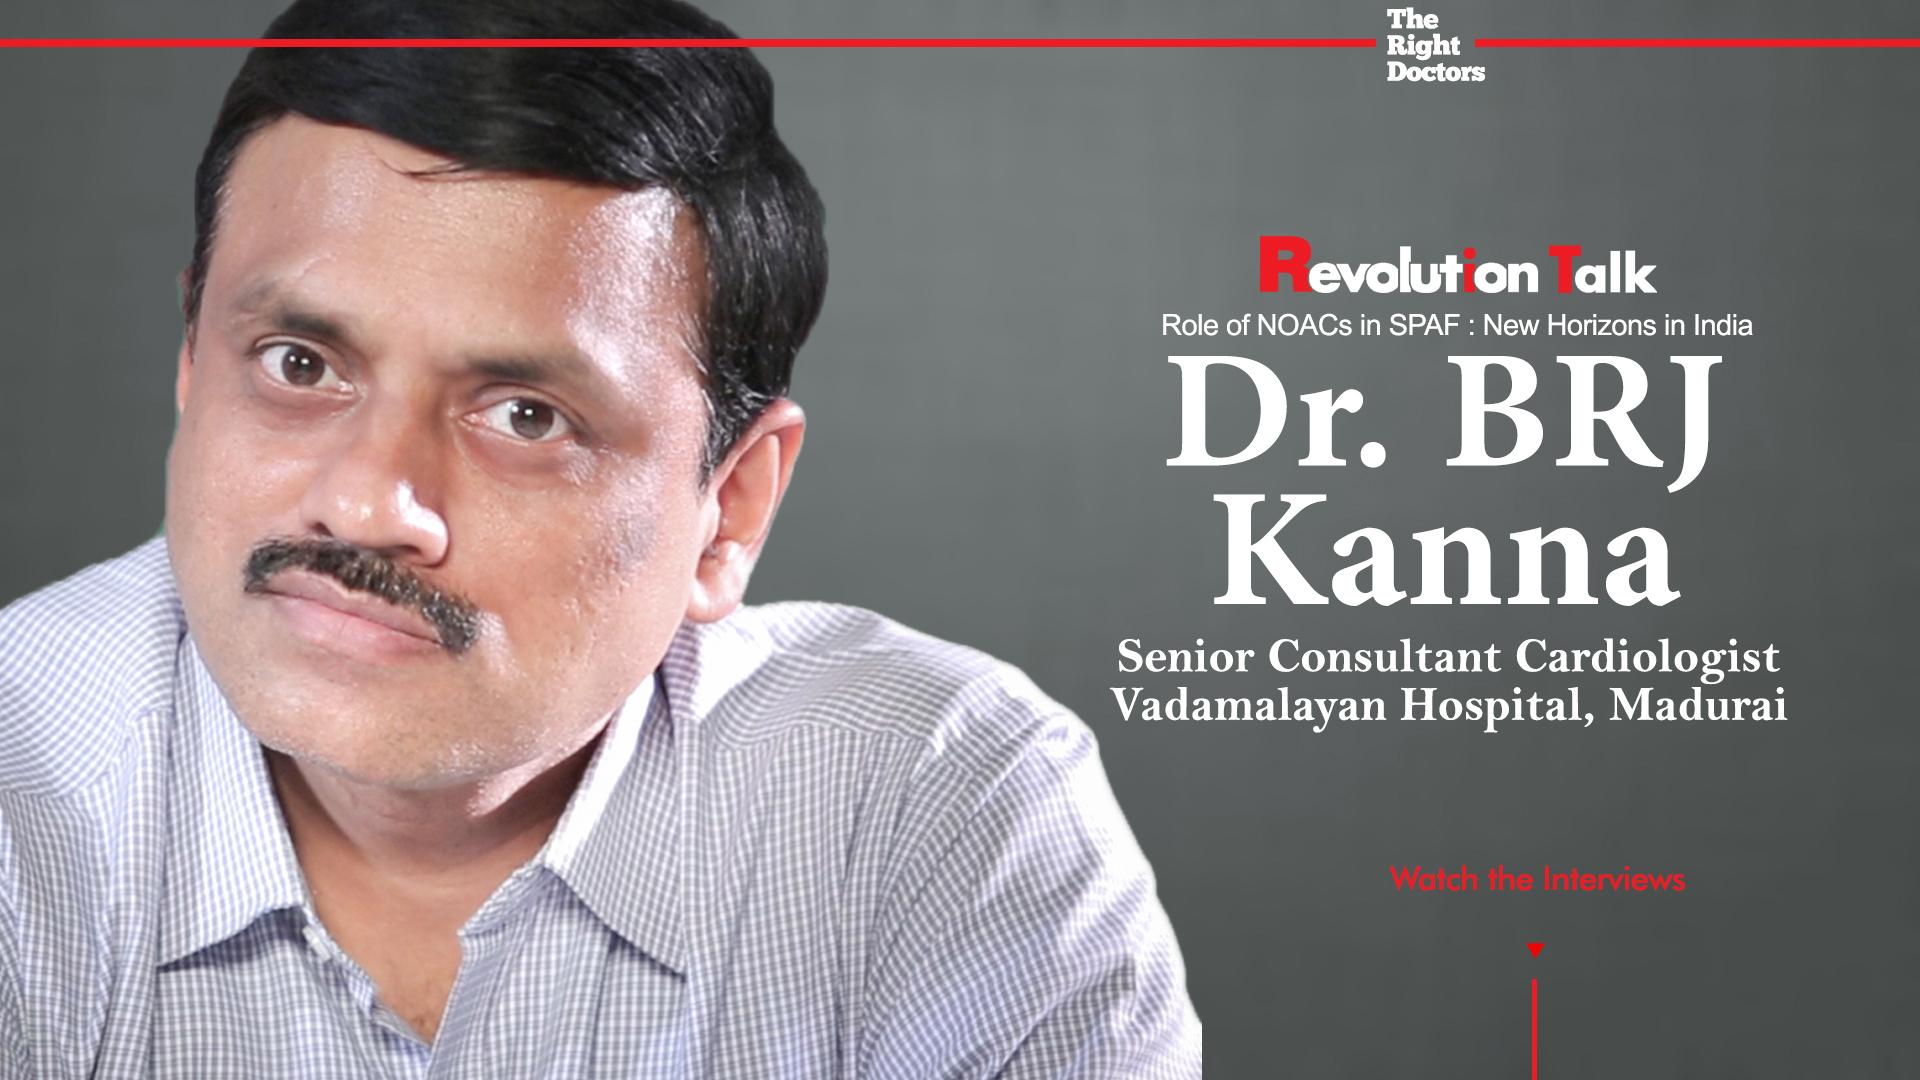 Dr. BRJ Kanna, Senior Consultant Cardiologist, Vadamalayan Hospital, Madurai